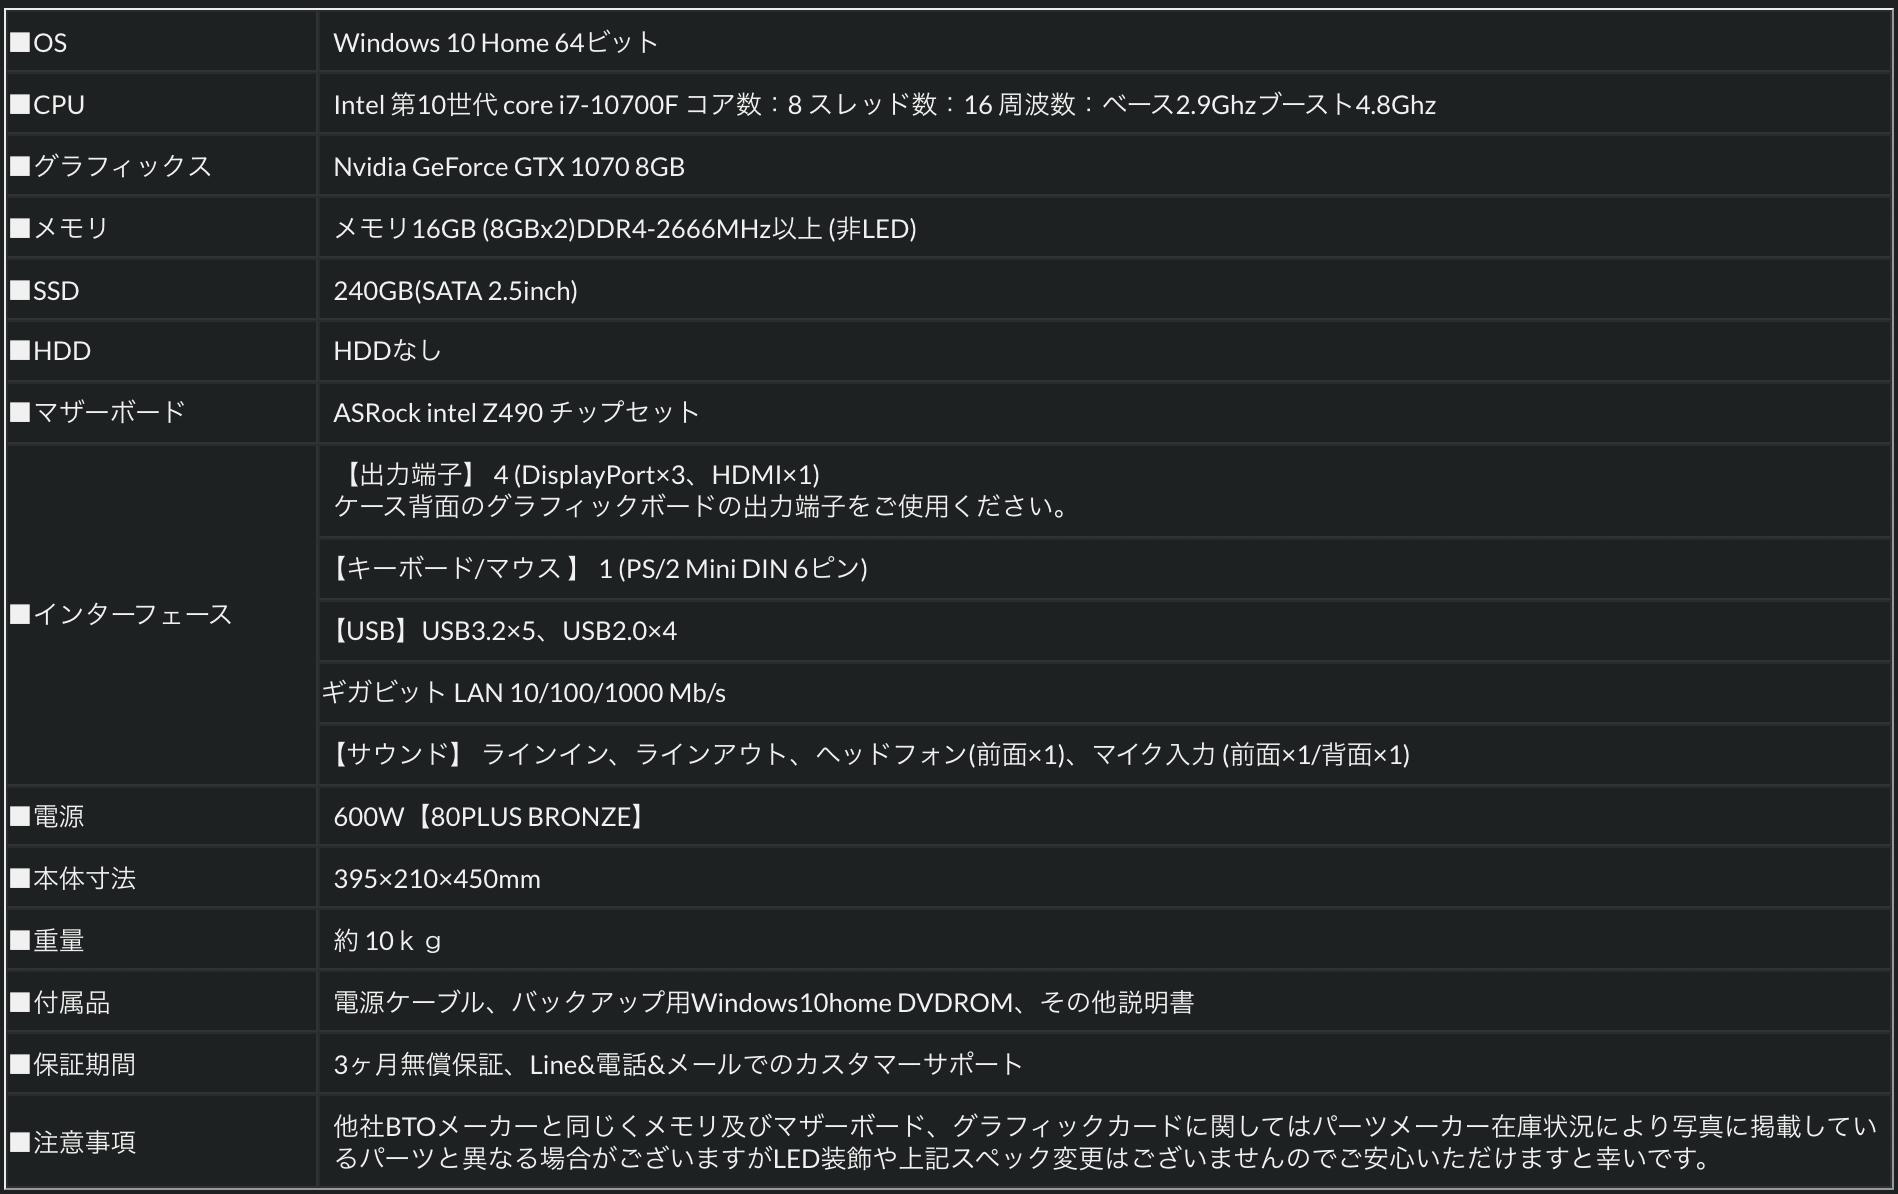 OUTLET No,SIRIUS11【Astromeda Sirius】の商品情報